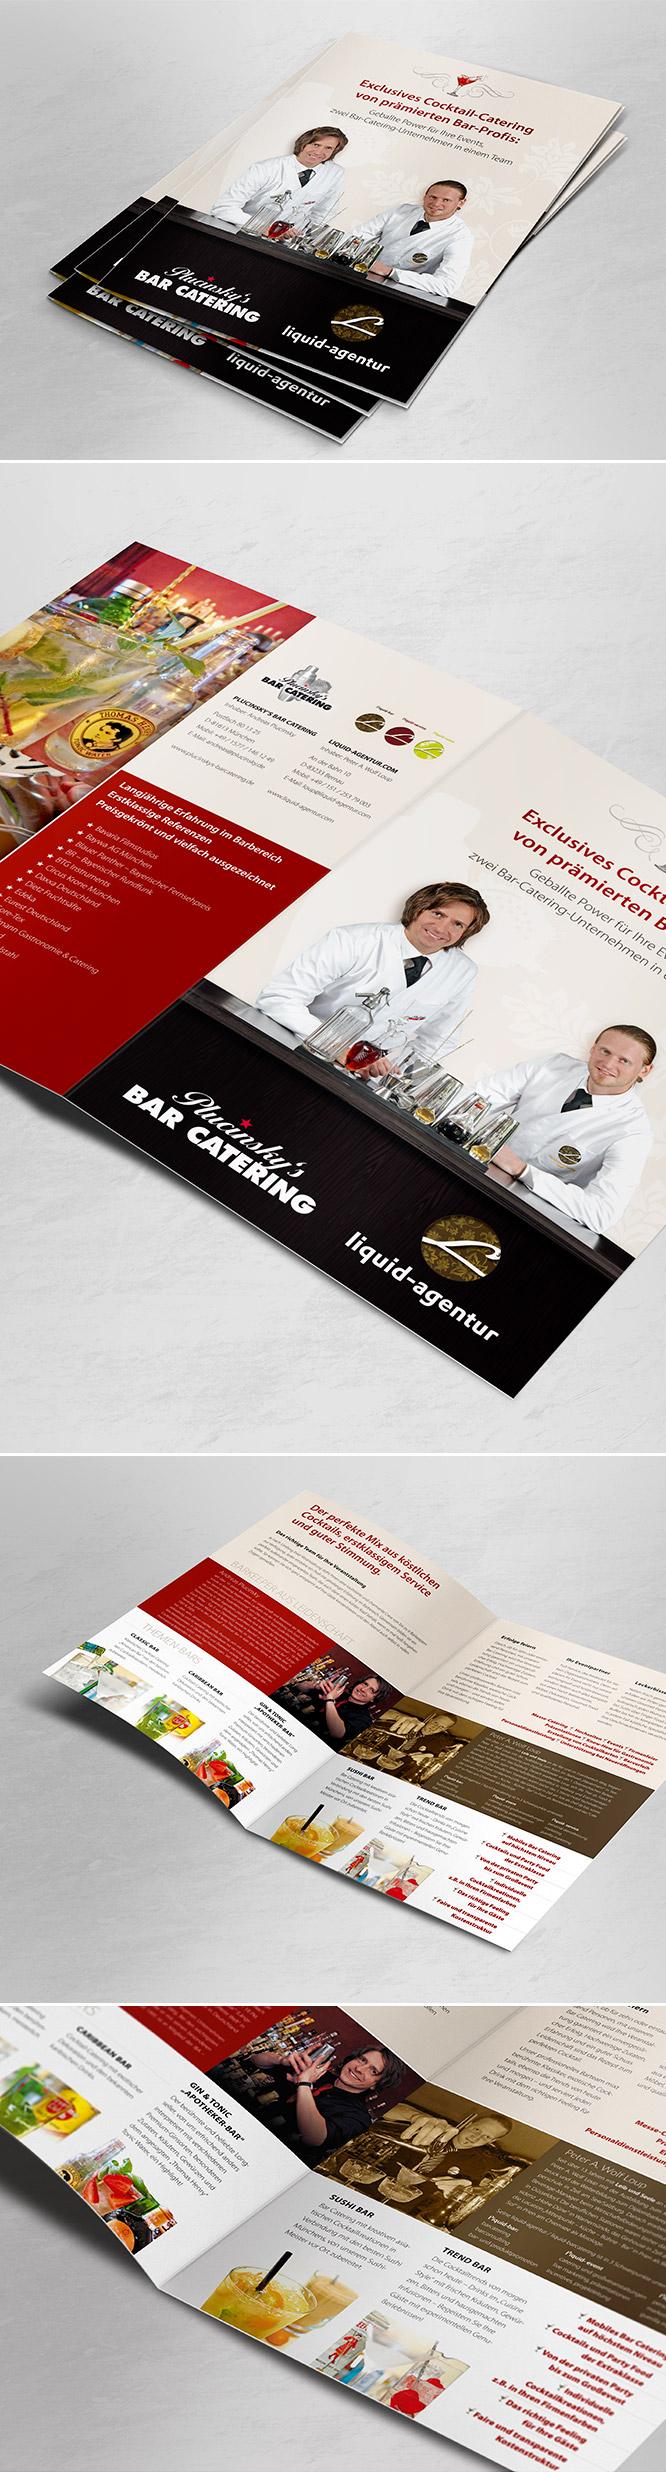 Grafikdesign Firmenprospekt für Plucinskys Bar Catering